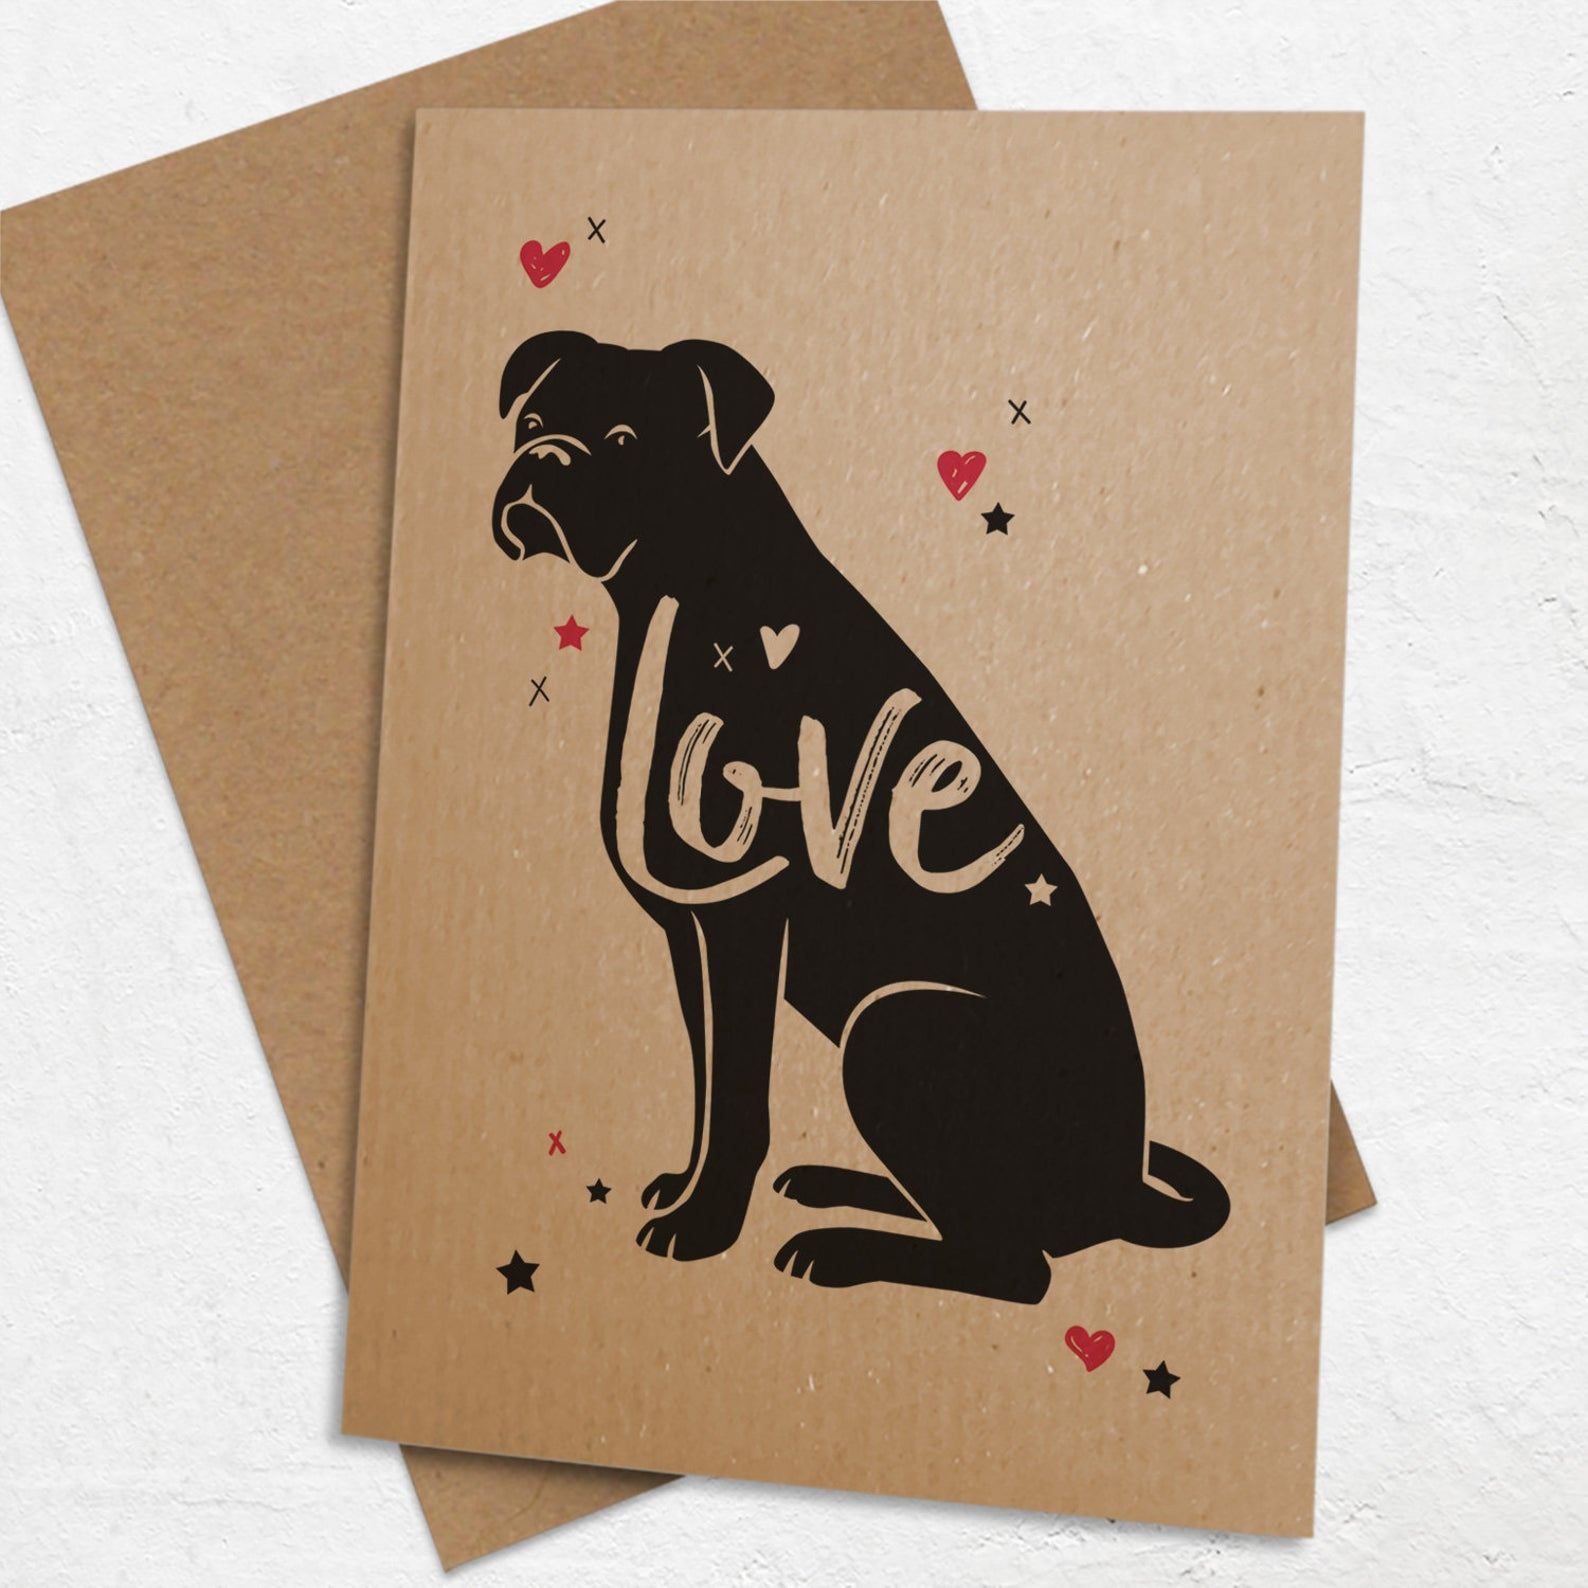 Boxer Dog Greeting Card via WellBredDesign on Etsy